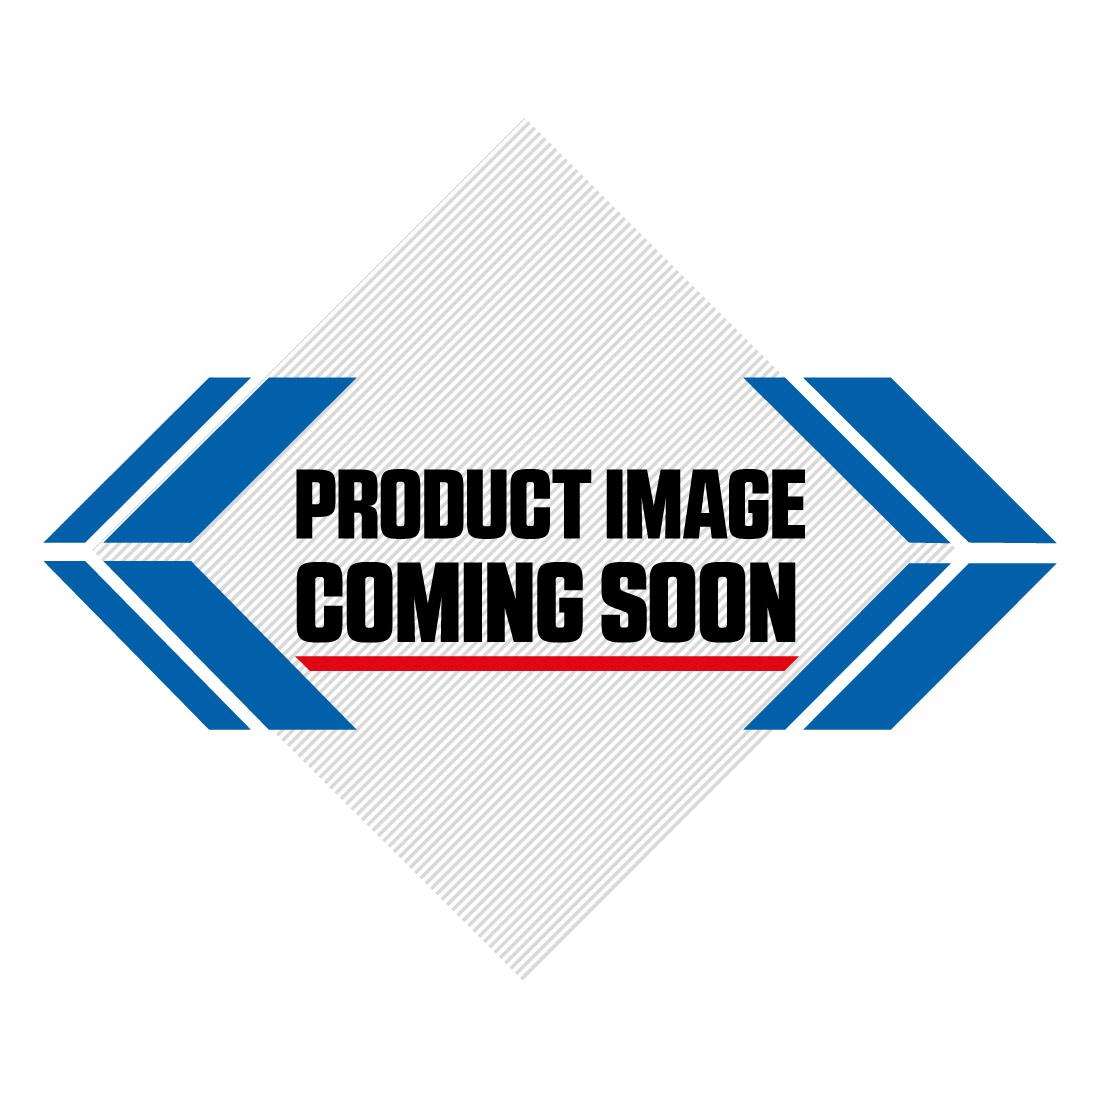 MDR STD Aluminium Clutch Lever Short KX 125 250 500 88-92 KXF RMZ 250 04 YZ 125 250 85-99 RM 125 250